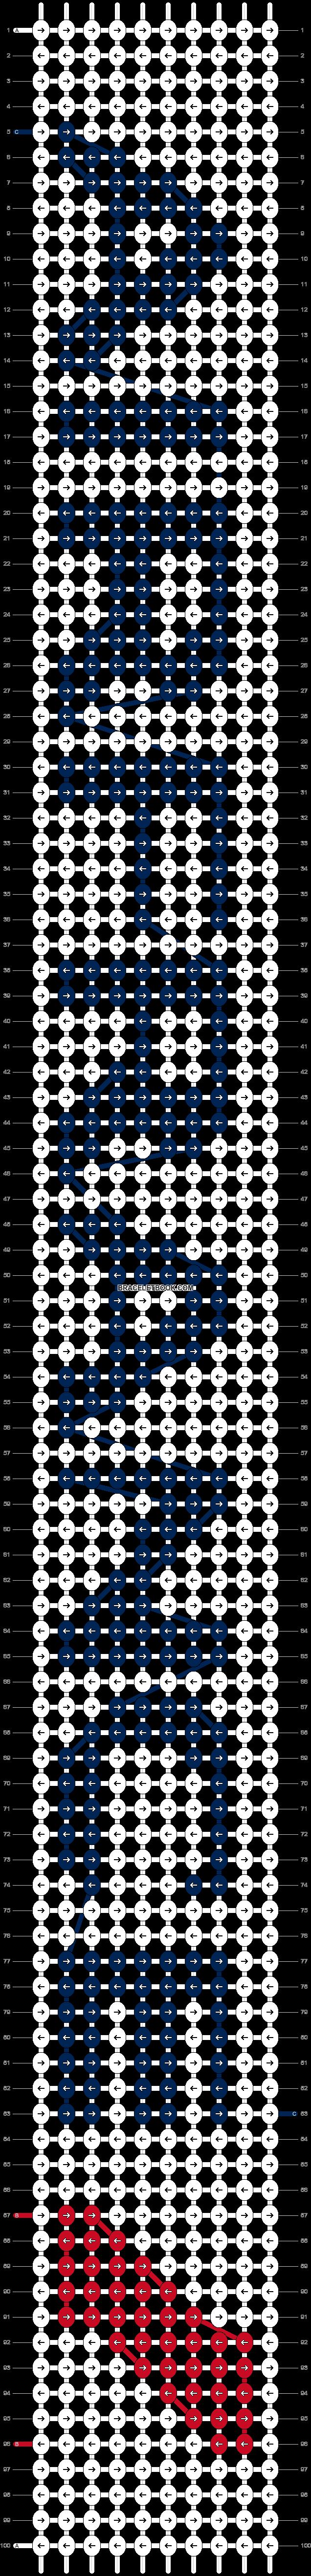 Alpha pattern #1432 pattern